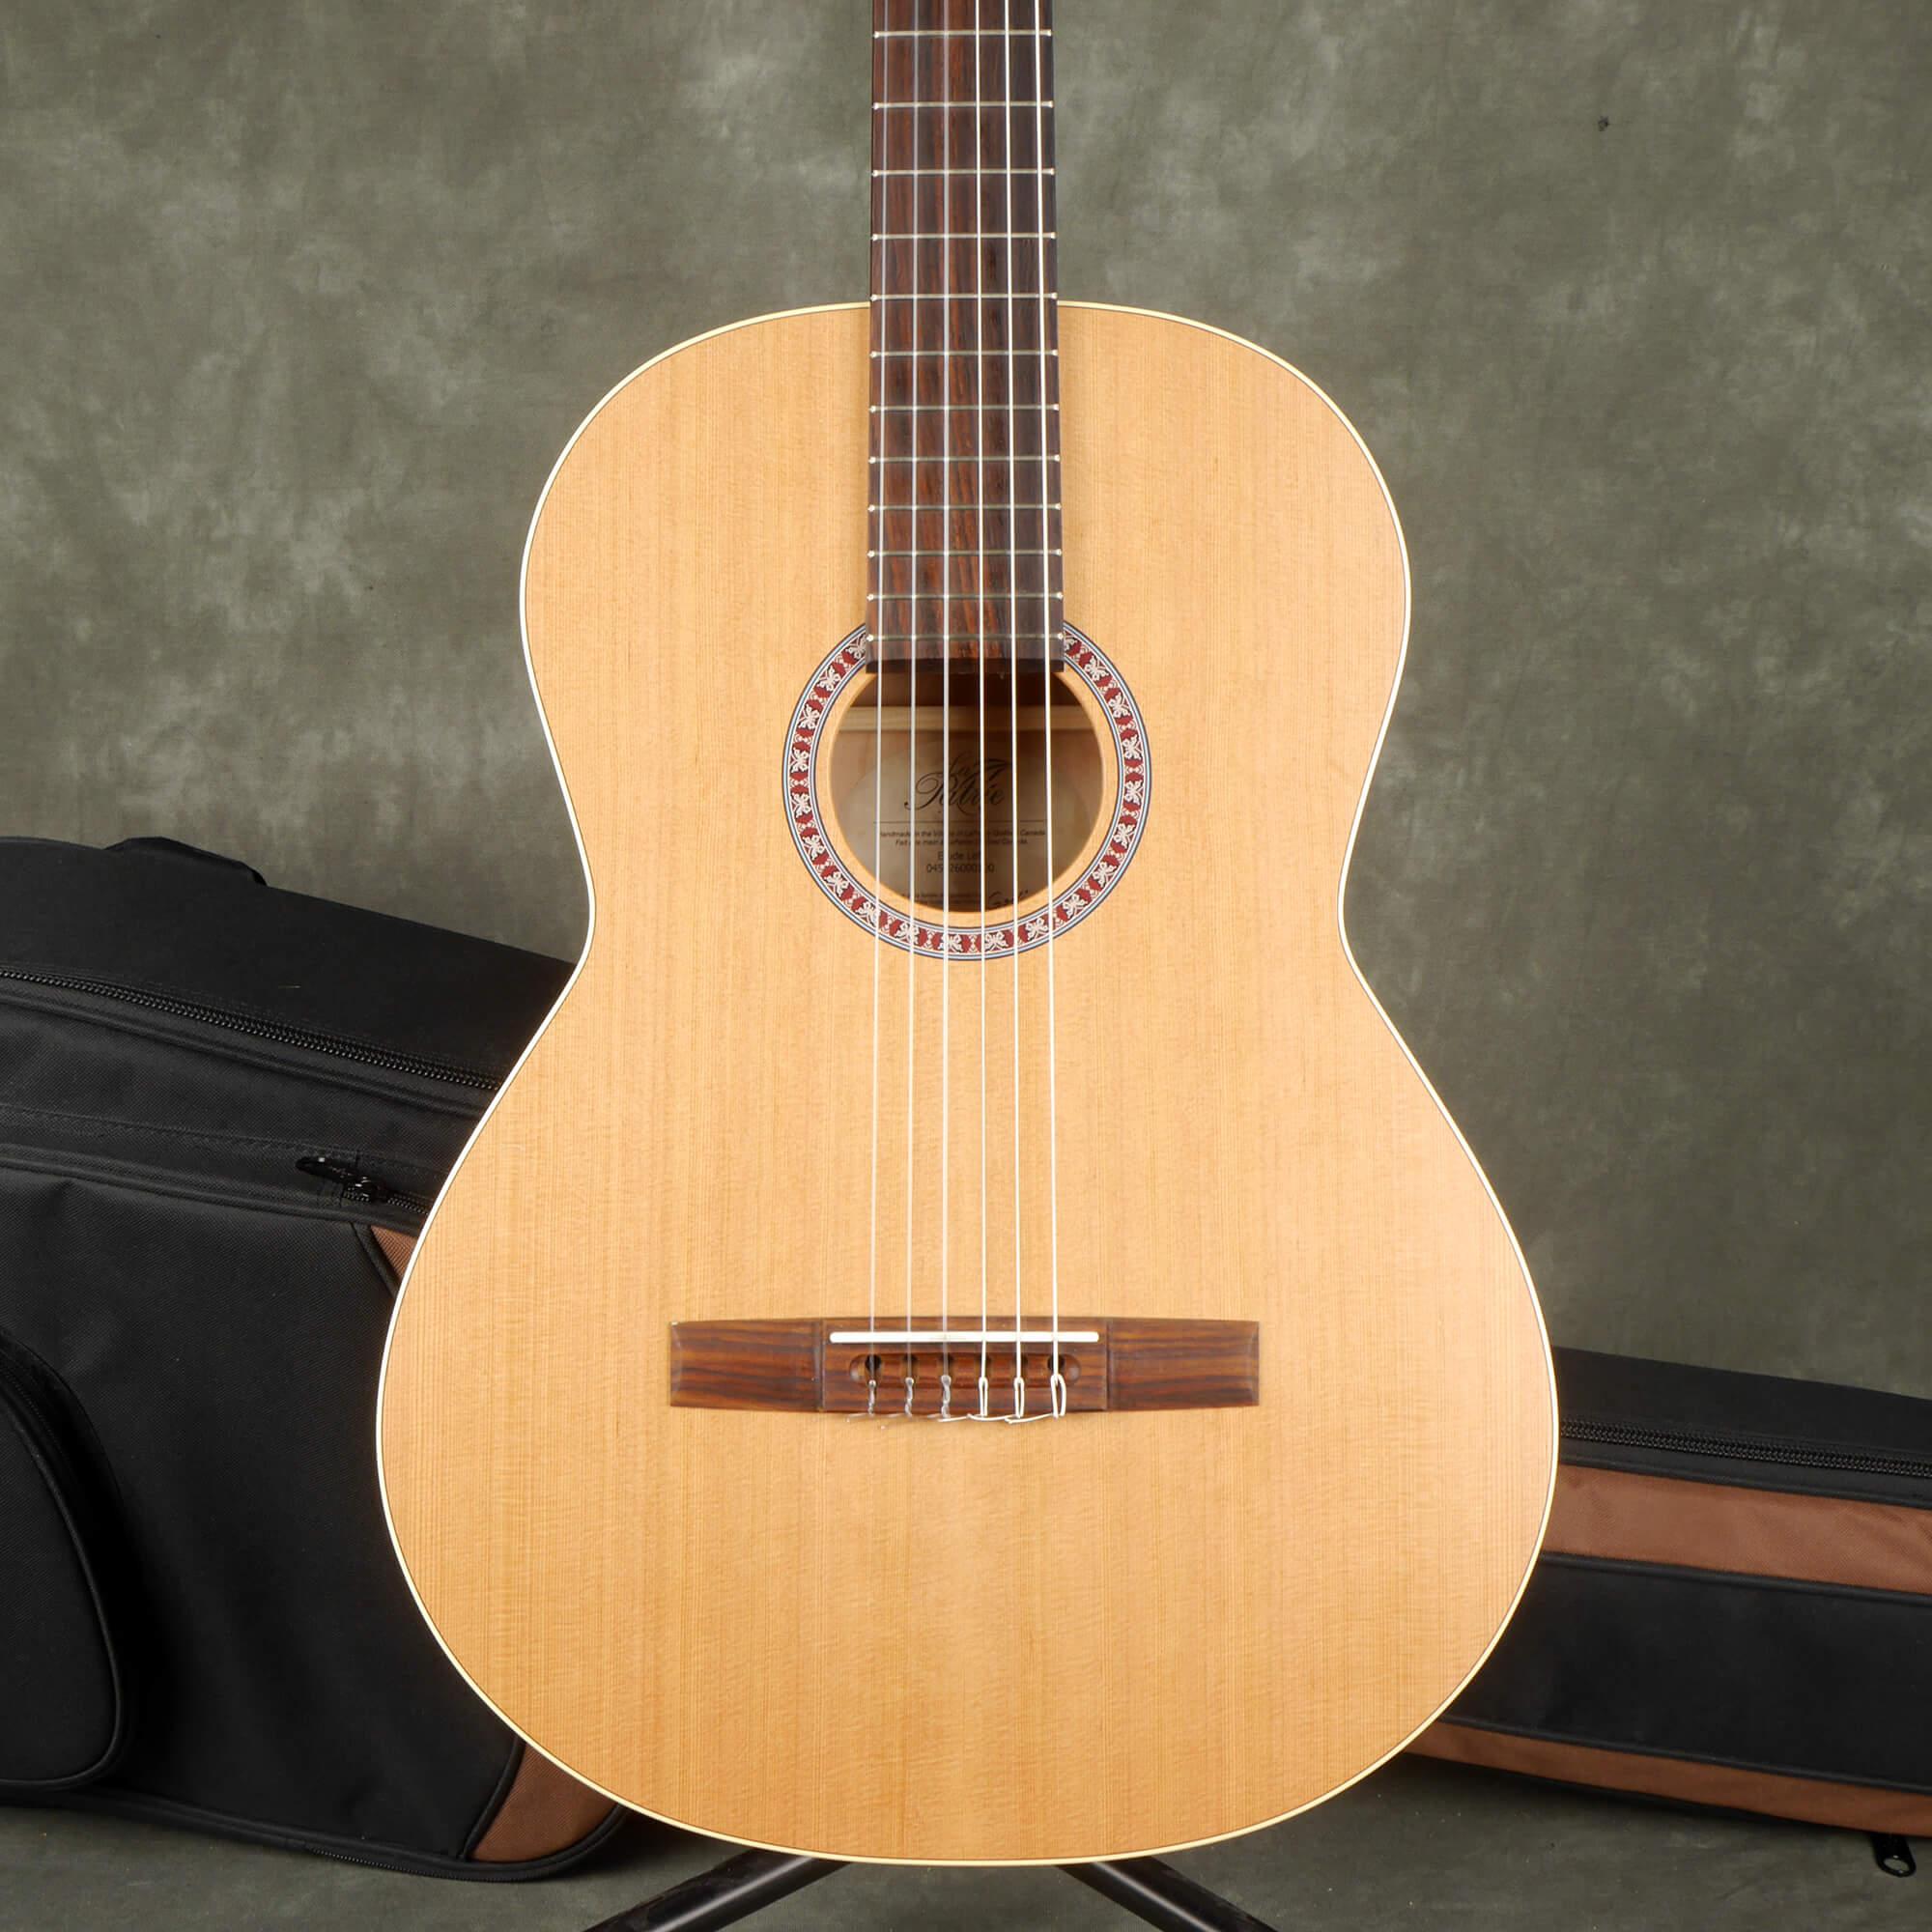 La Patrie Etude Classical Acoustic Guitar, Left Handed w/Gig Bag - 2nd Hand